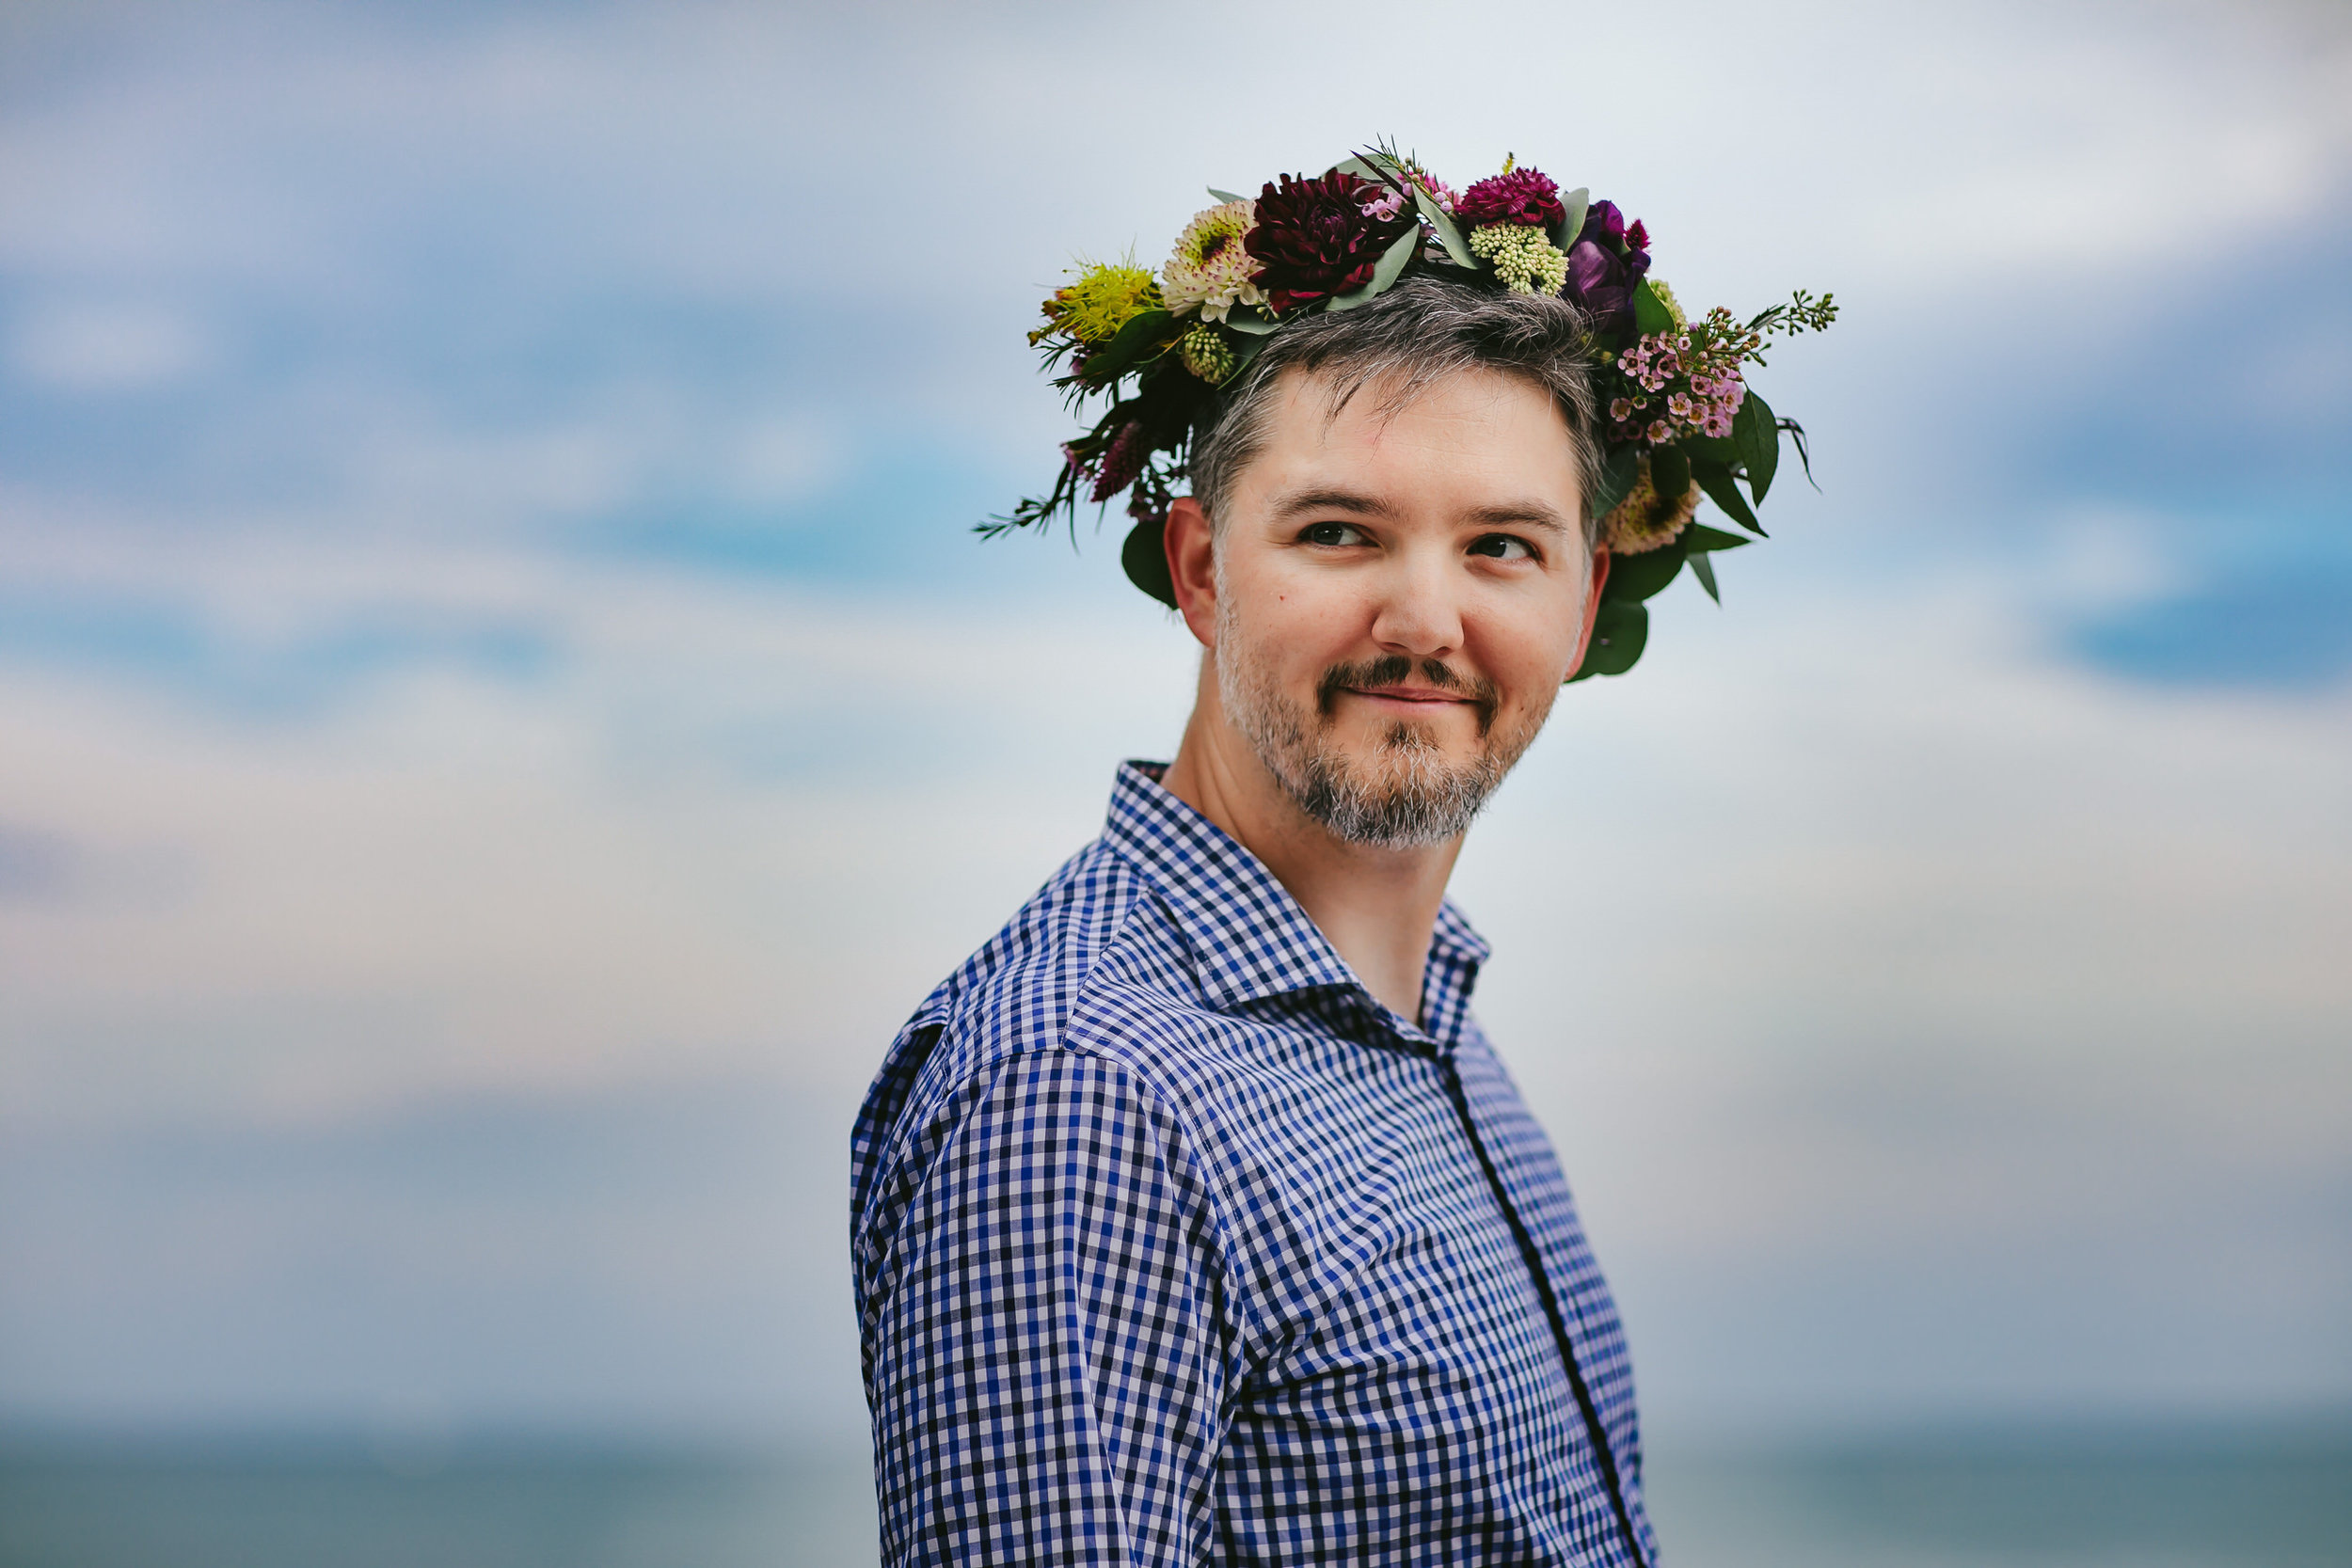 Edgewater Chicago Pregnancy Portraits Husband Flower Crown.jpg